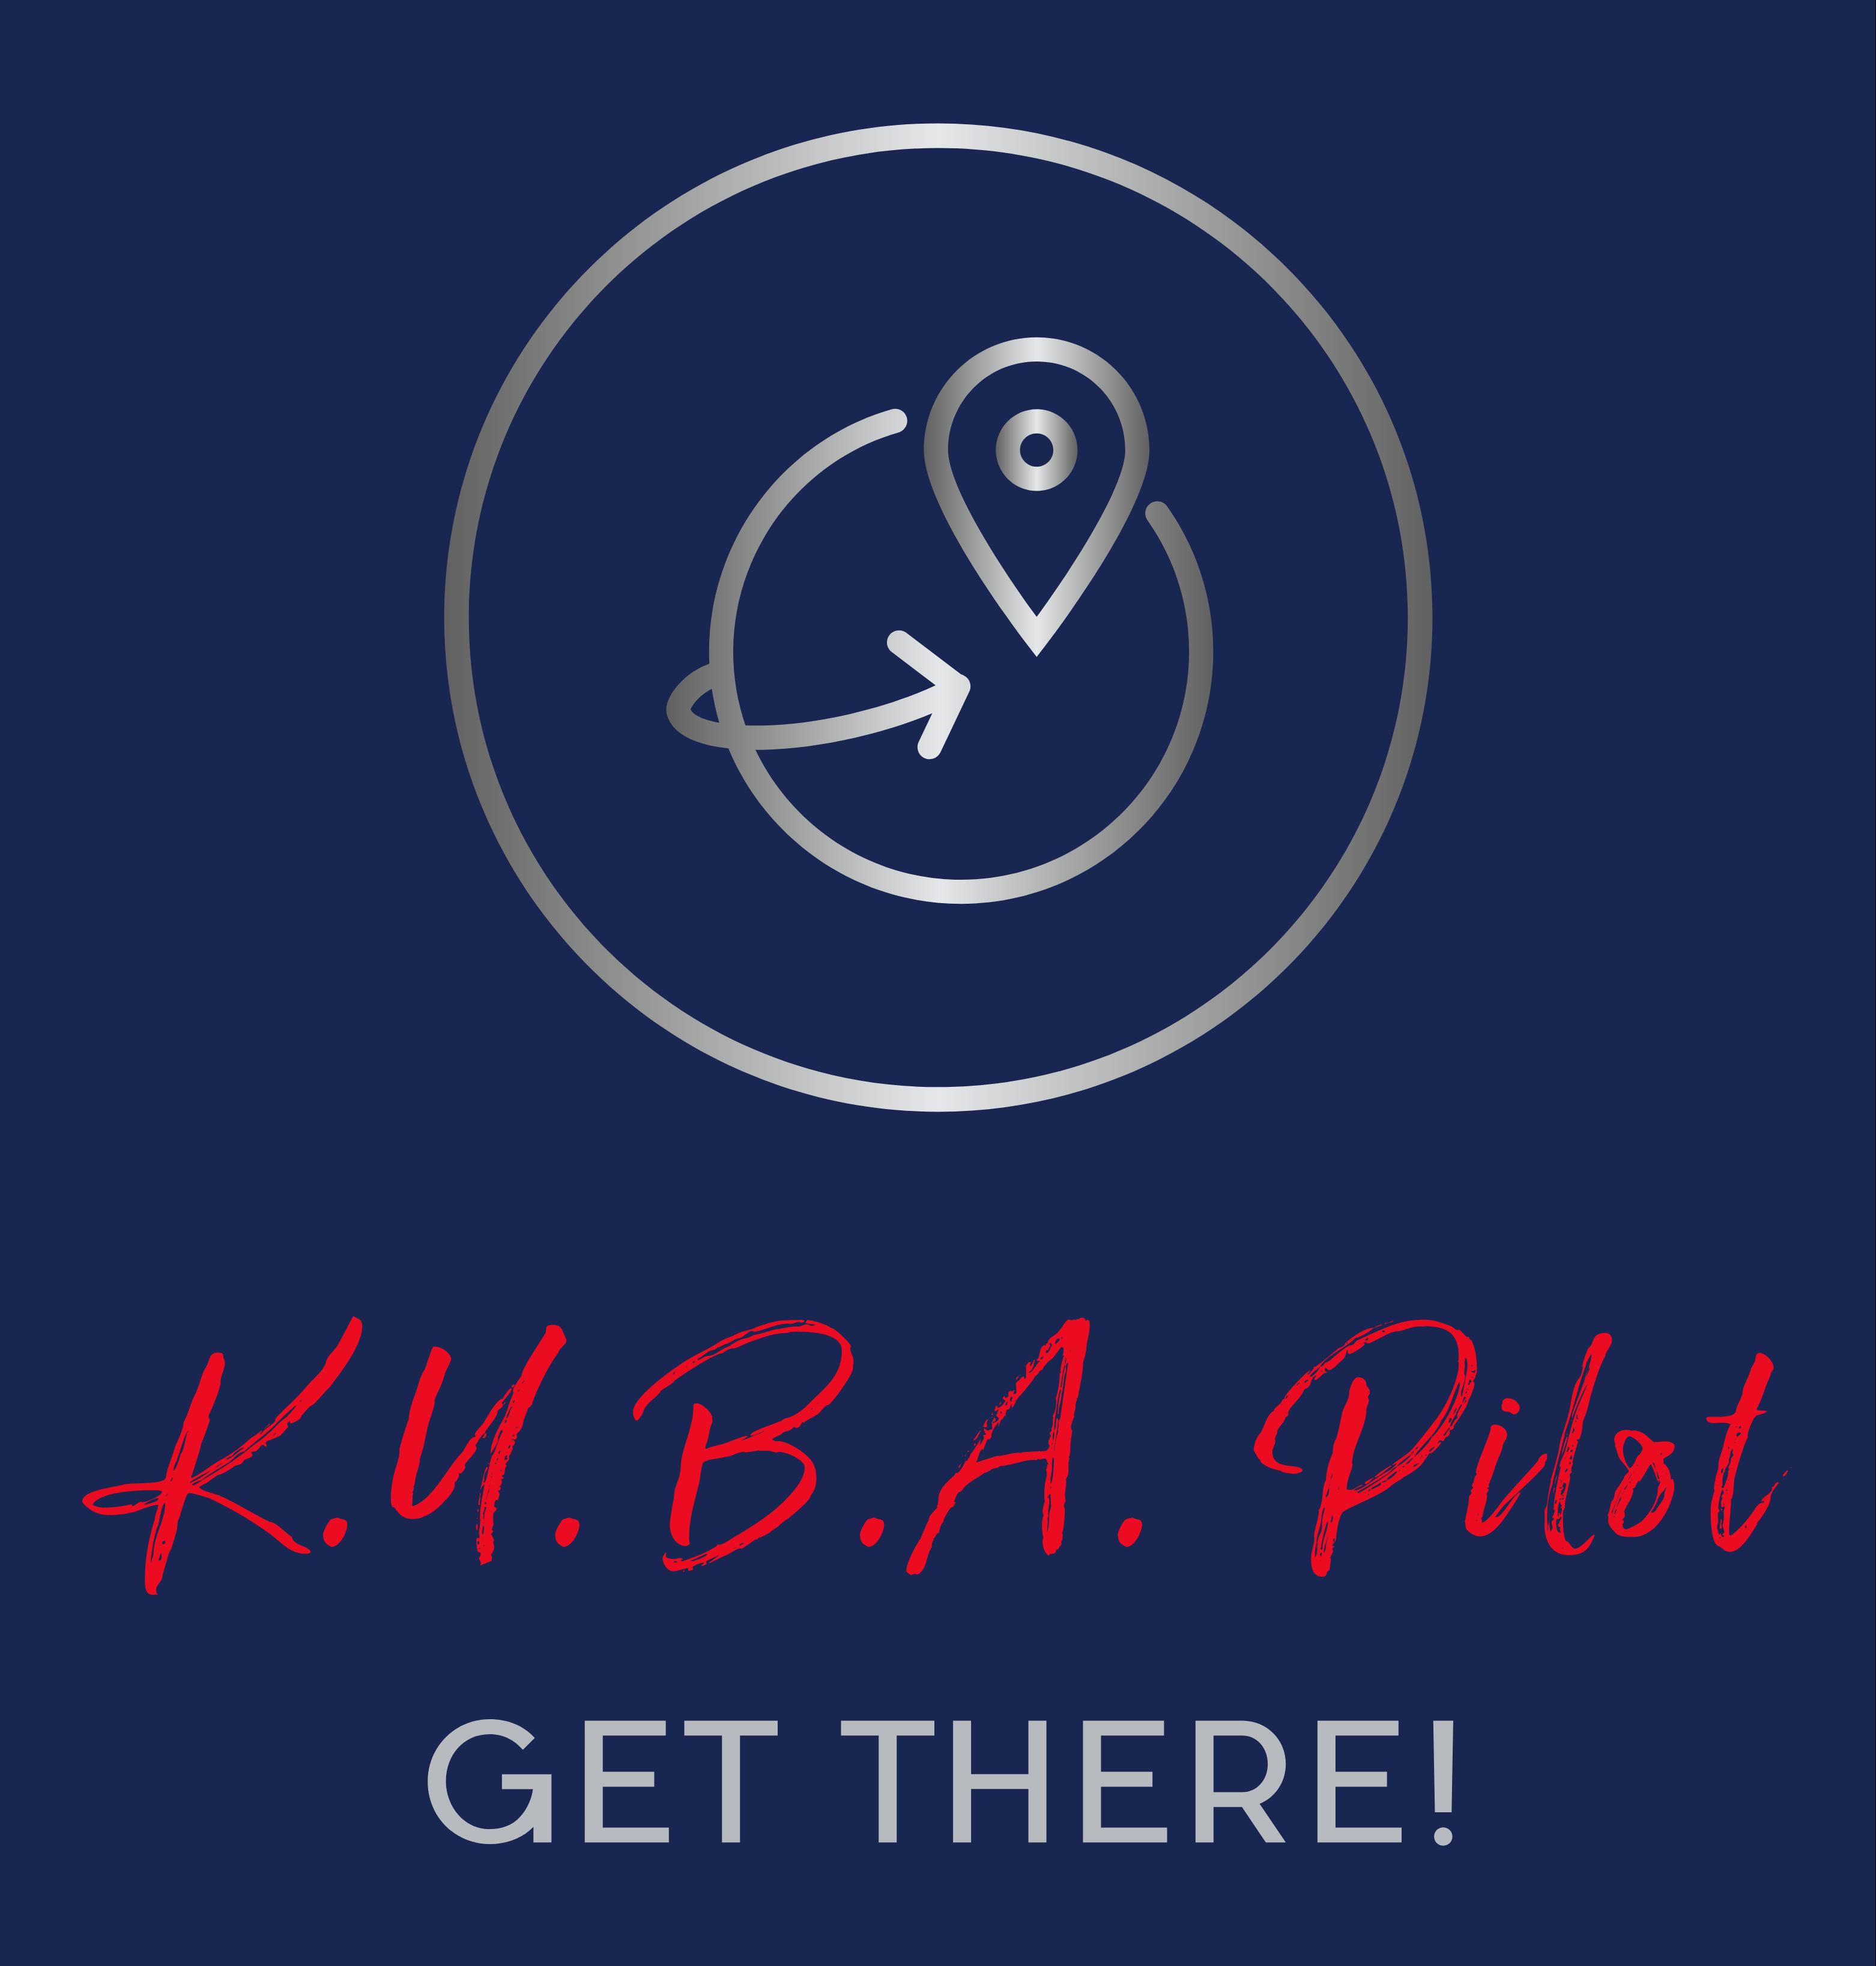 K.U.B.A. Pilot